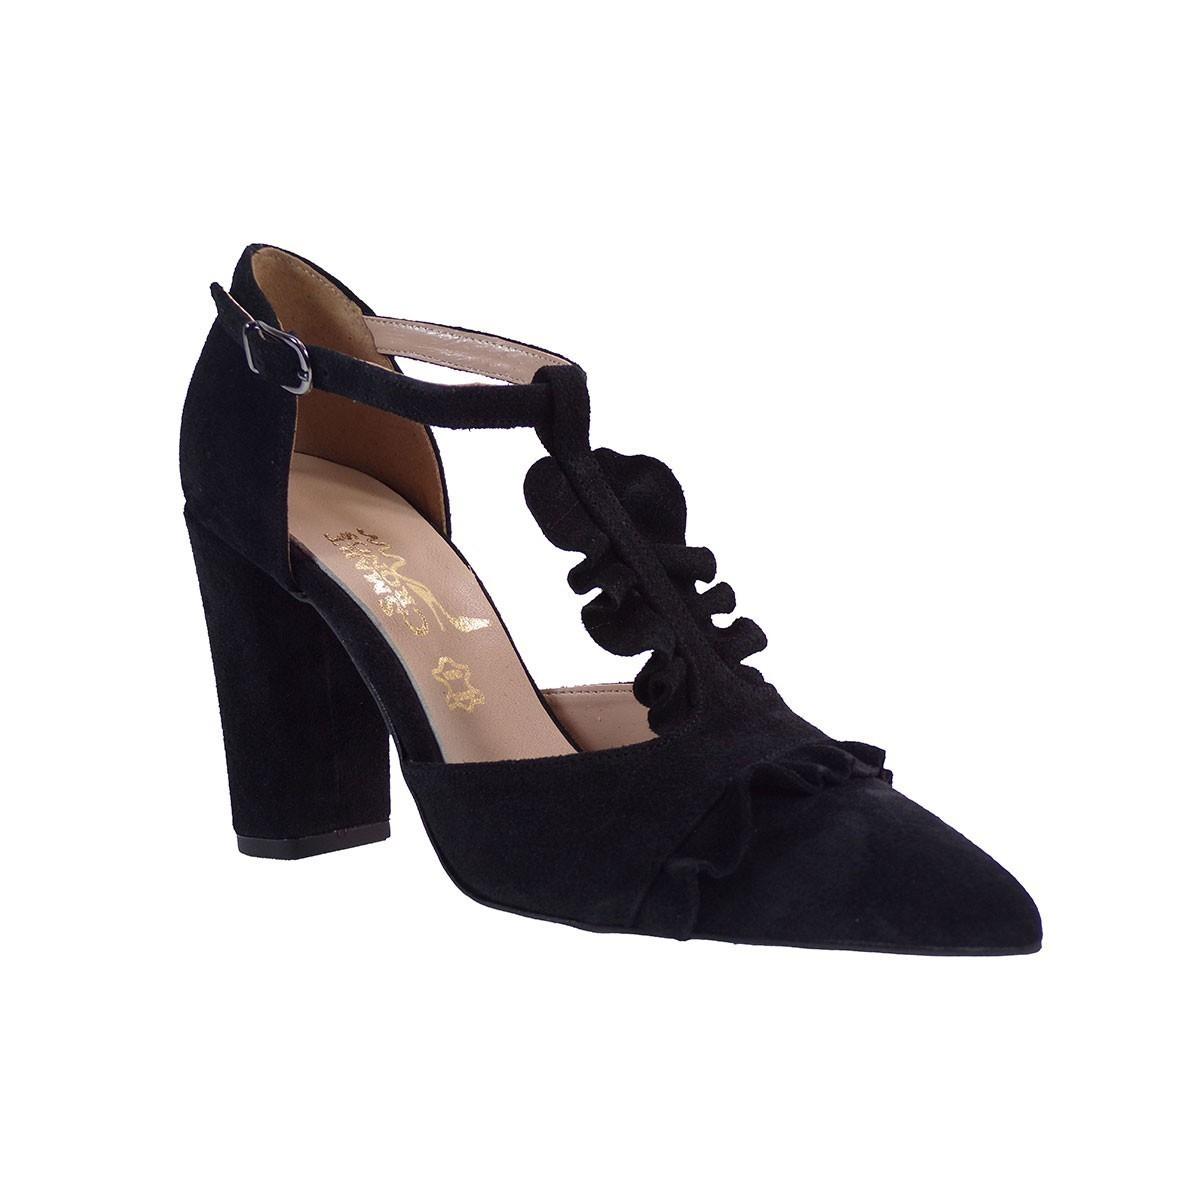 SMART CRONOS Γυναικεία Παπούτσια Γόβες 6709/3544 Μαύρο Δέρμα Καστόρι